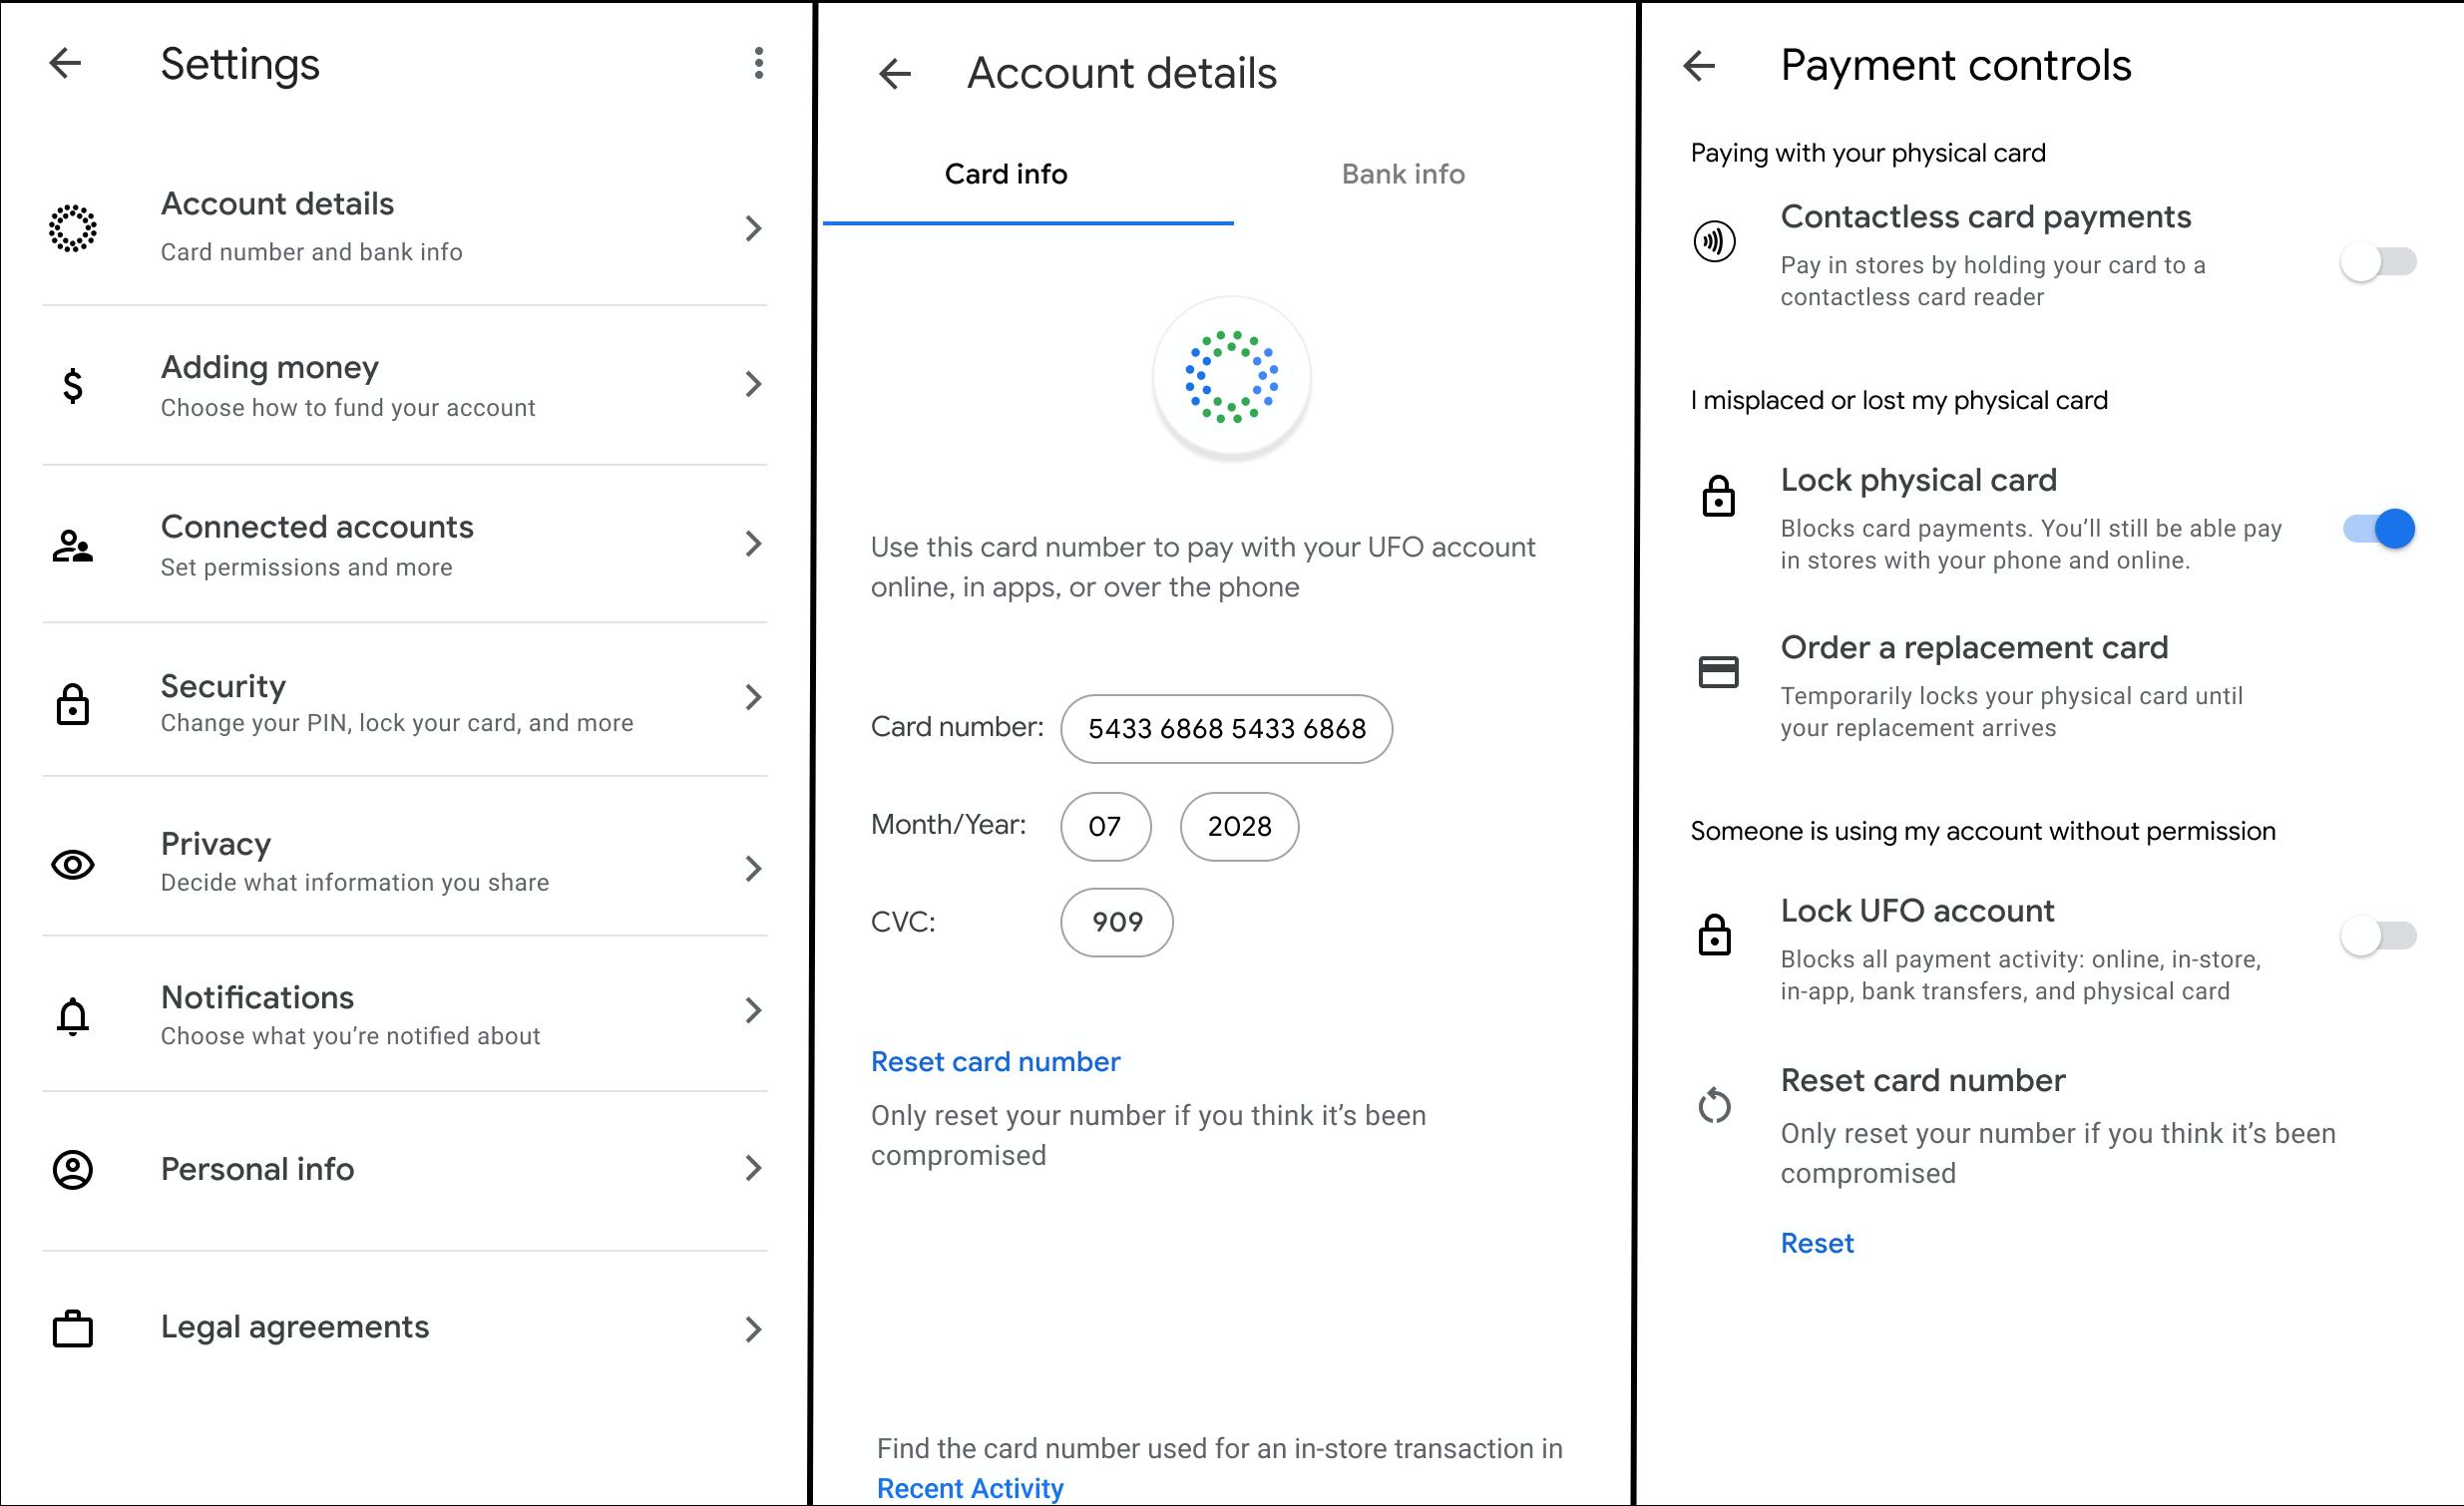 Google Card Privacy Security apple card, banco online, Cartão de débito, google, Google Card